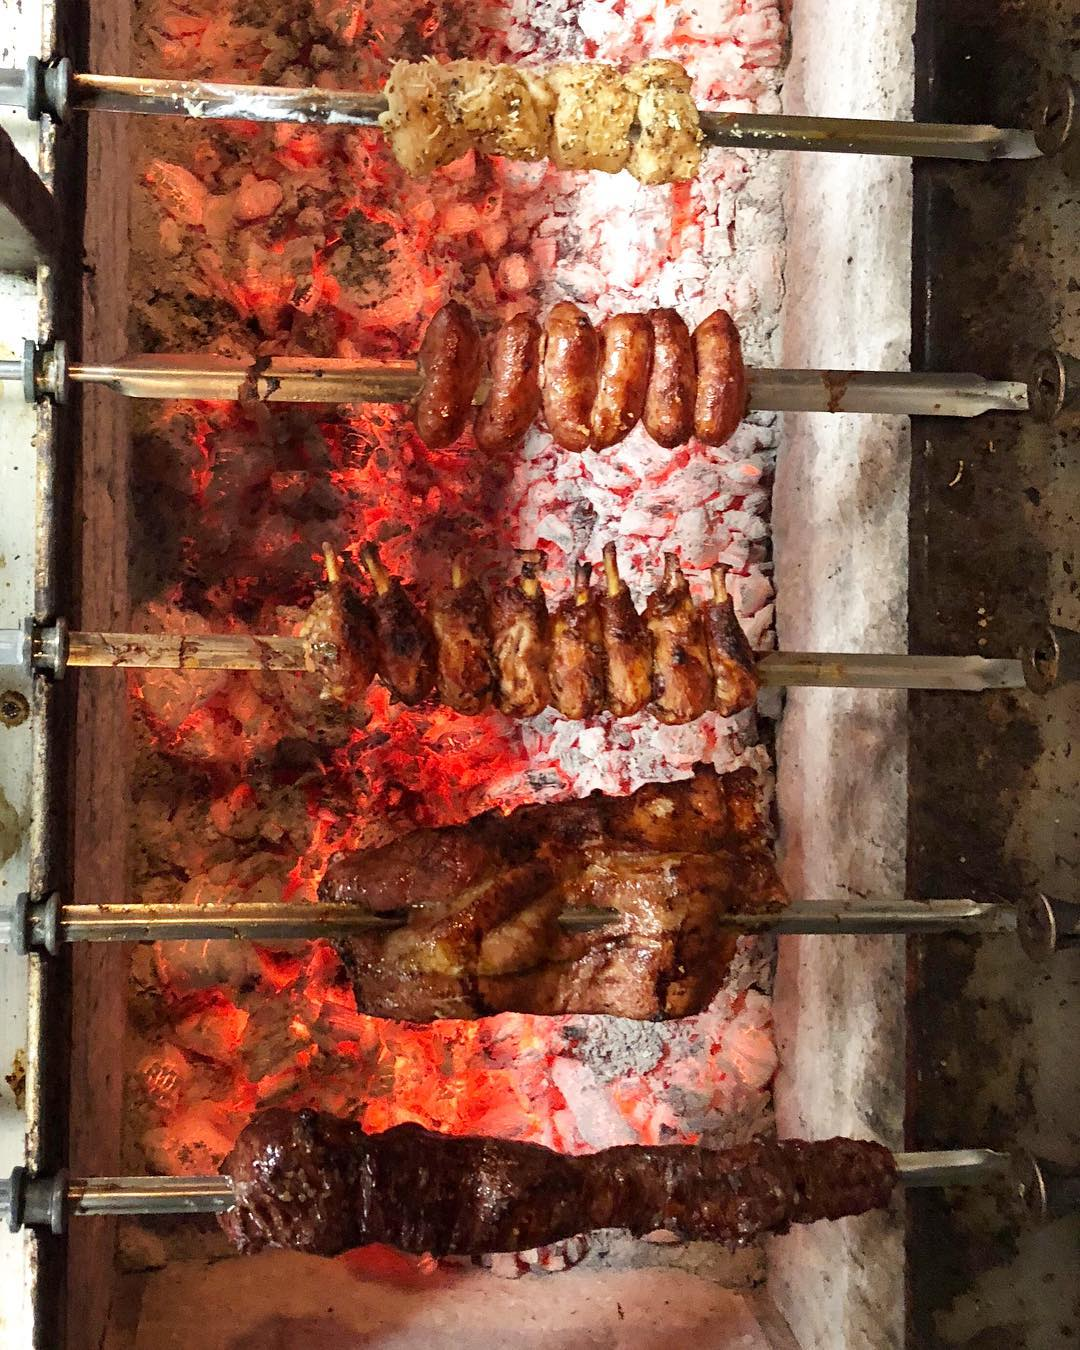 Oc Grub Guide 7/12-7/18: Oreo, Vino And Lobster Taco! photo